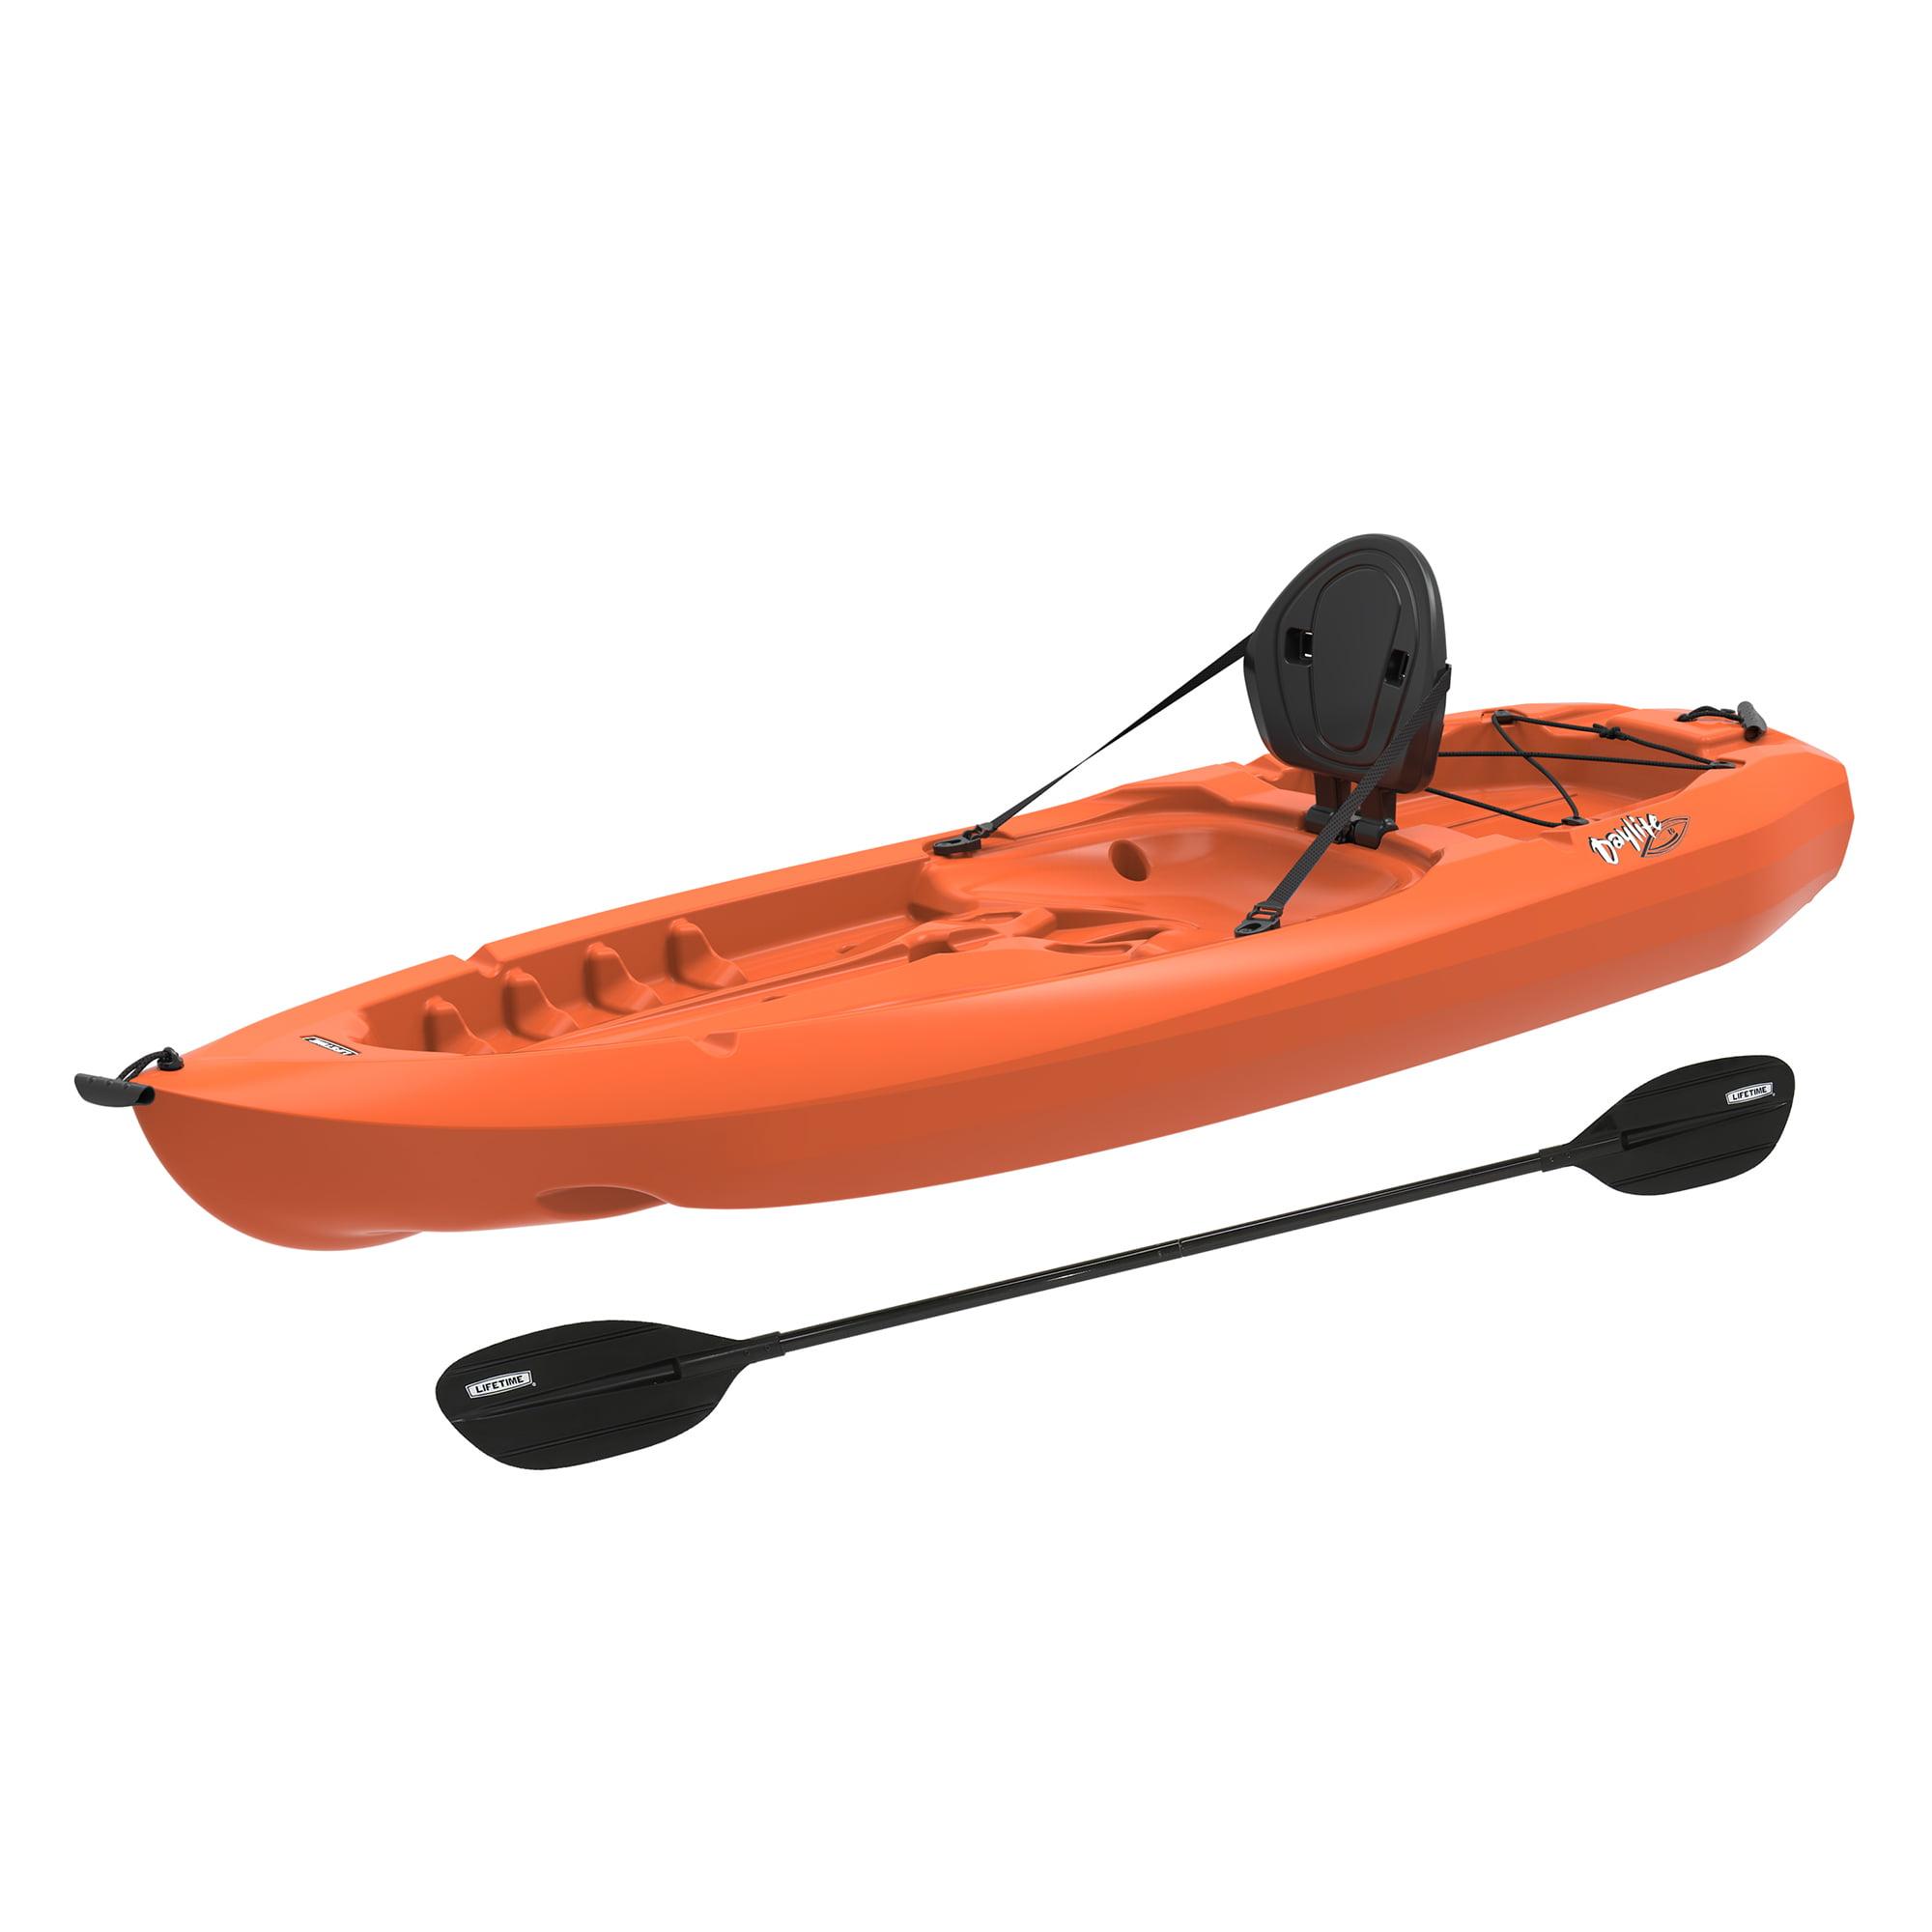 Lifetime 8' Daylite Kayak, Orange With Bonus Paddle, 90706